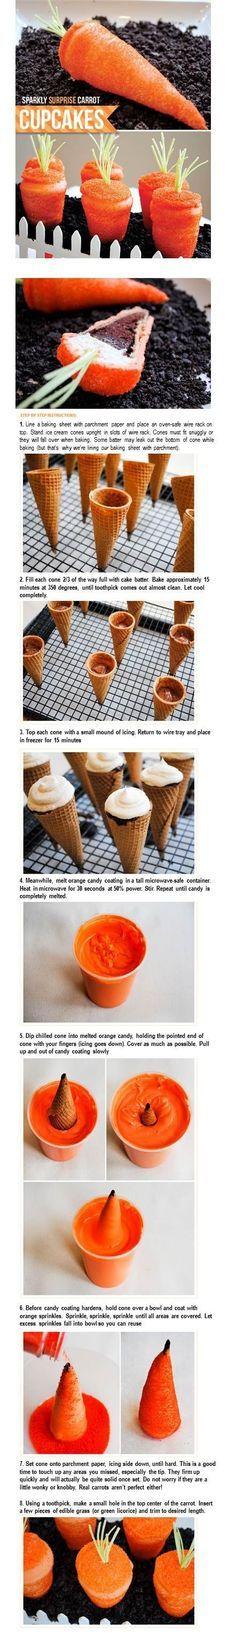 Carrot look cupcakes http://sulia.com/my_thoughts/bdbb016f-76eb-485b-a8a1-af53ad18d15b/?source=pin&action=share&btn=big&form_factor=desktop&sharer_id=125502693&is_sharer_author=true&pinner=125502693